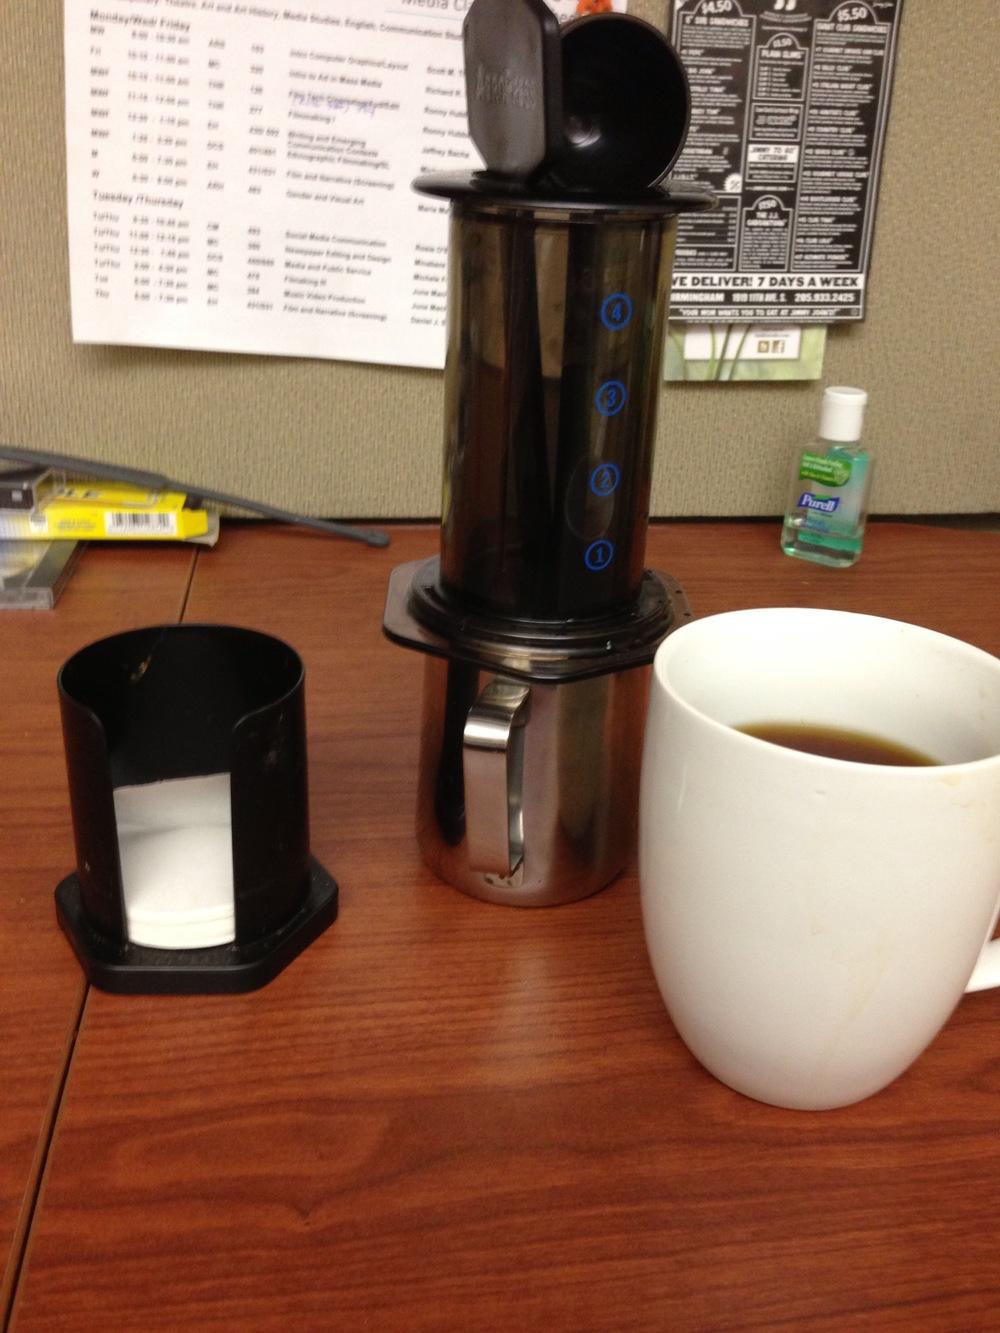 Coffee at Work: AeroPress